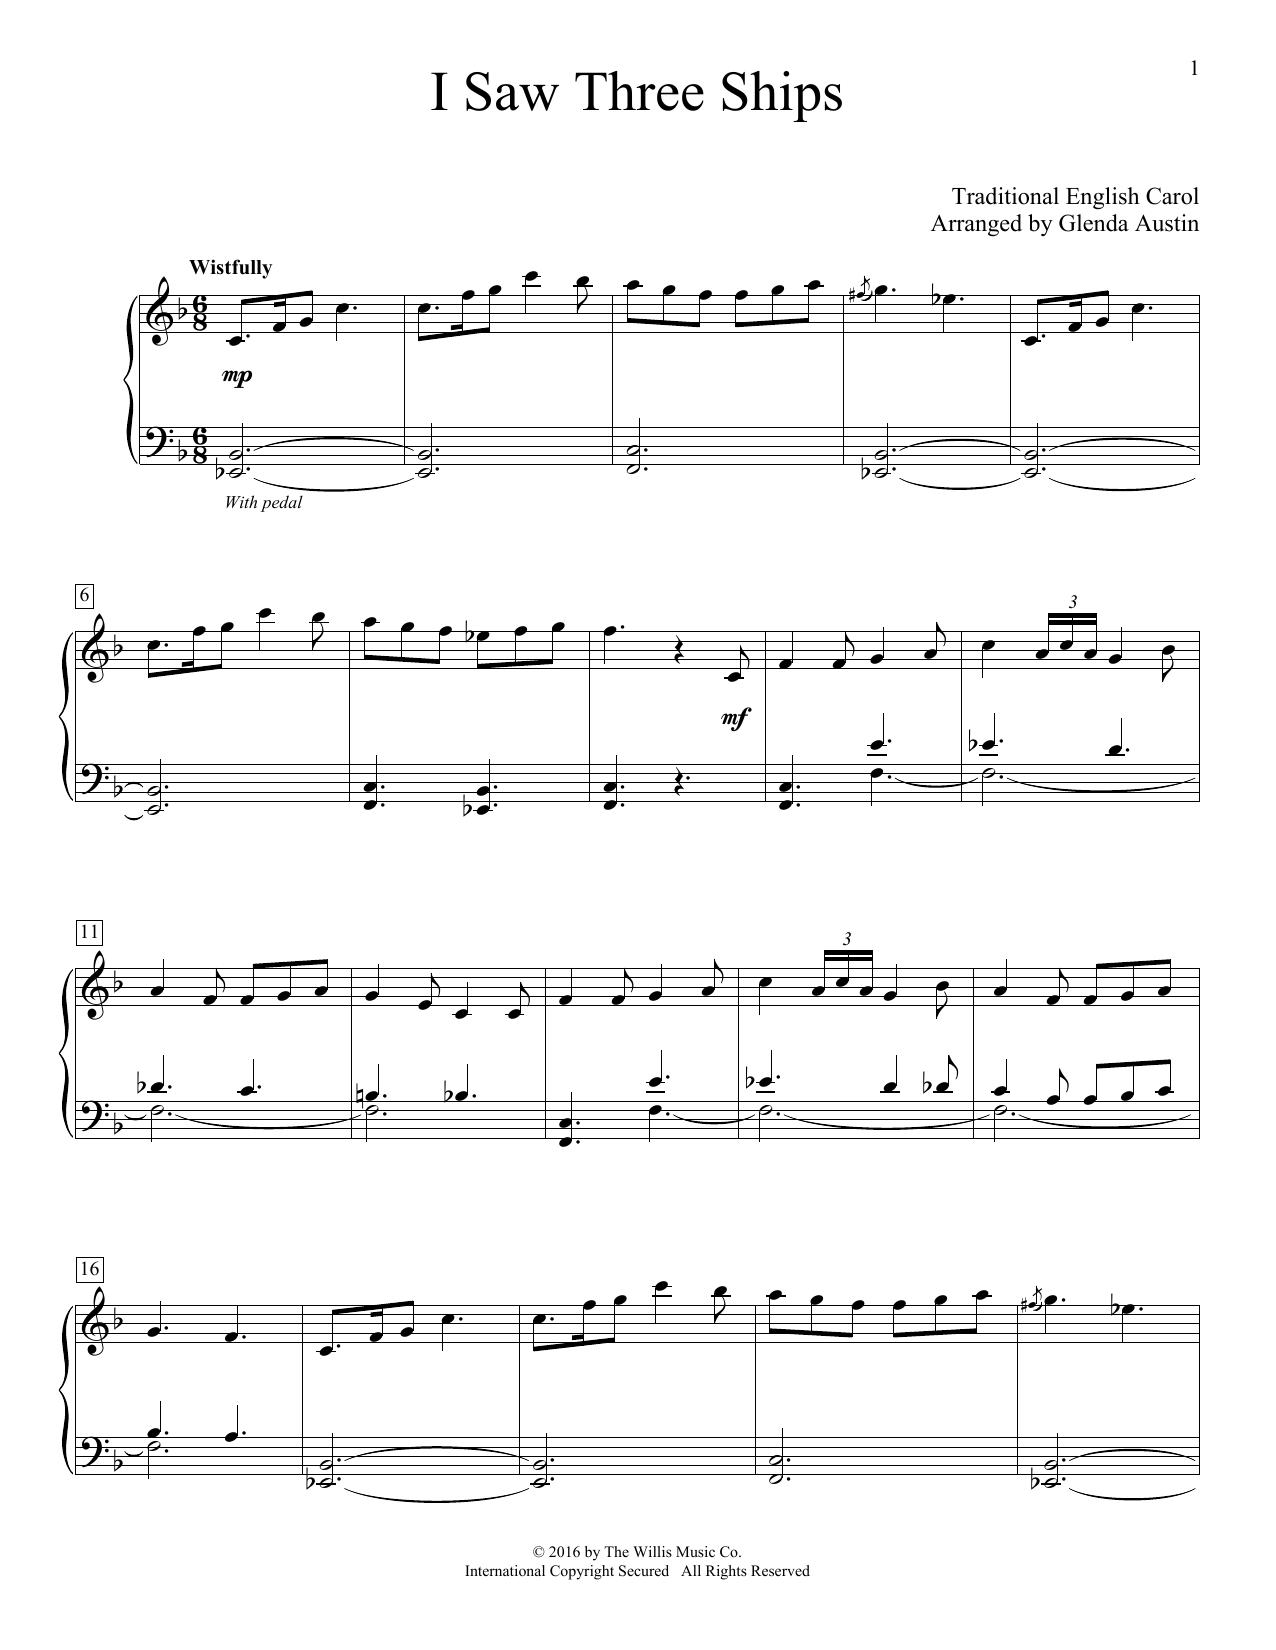 Glenda Austin I Saw Three Ships sheet music notes and chords. Download Printable PDF.